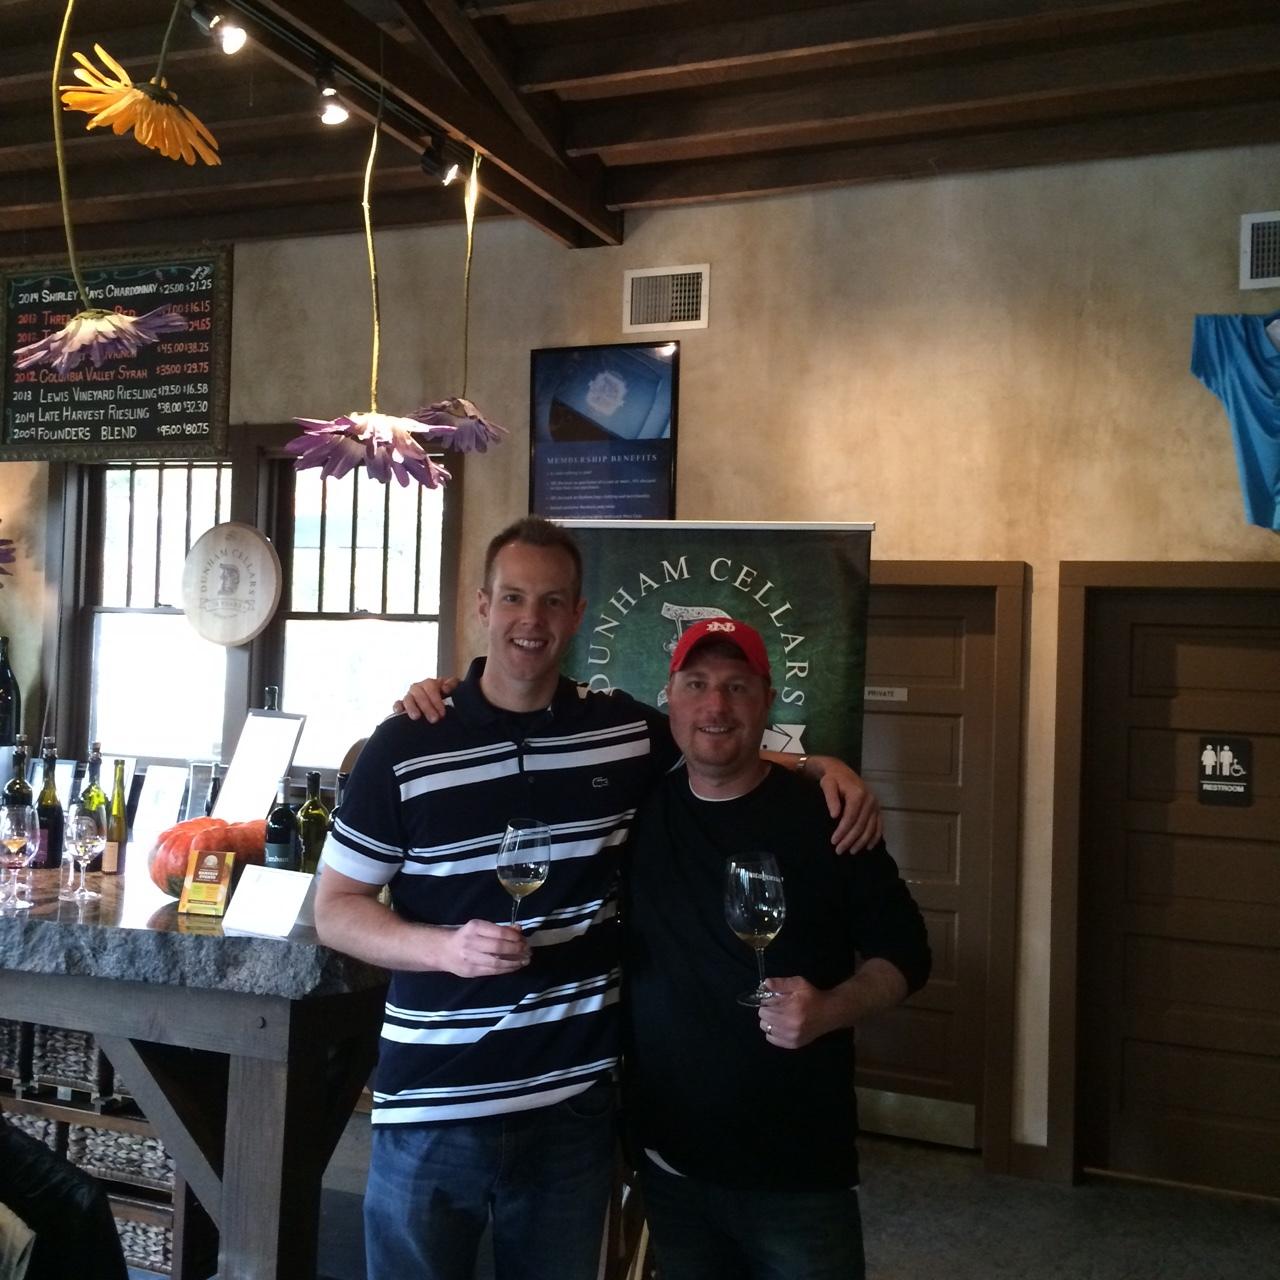 Reviewing the new Dunham releases with superstar winemaker, Dan Wampfler